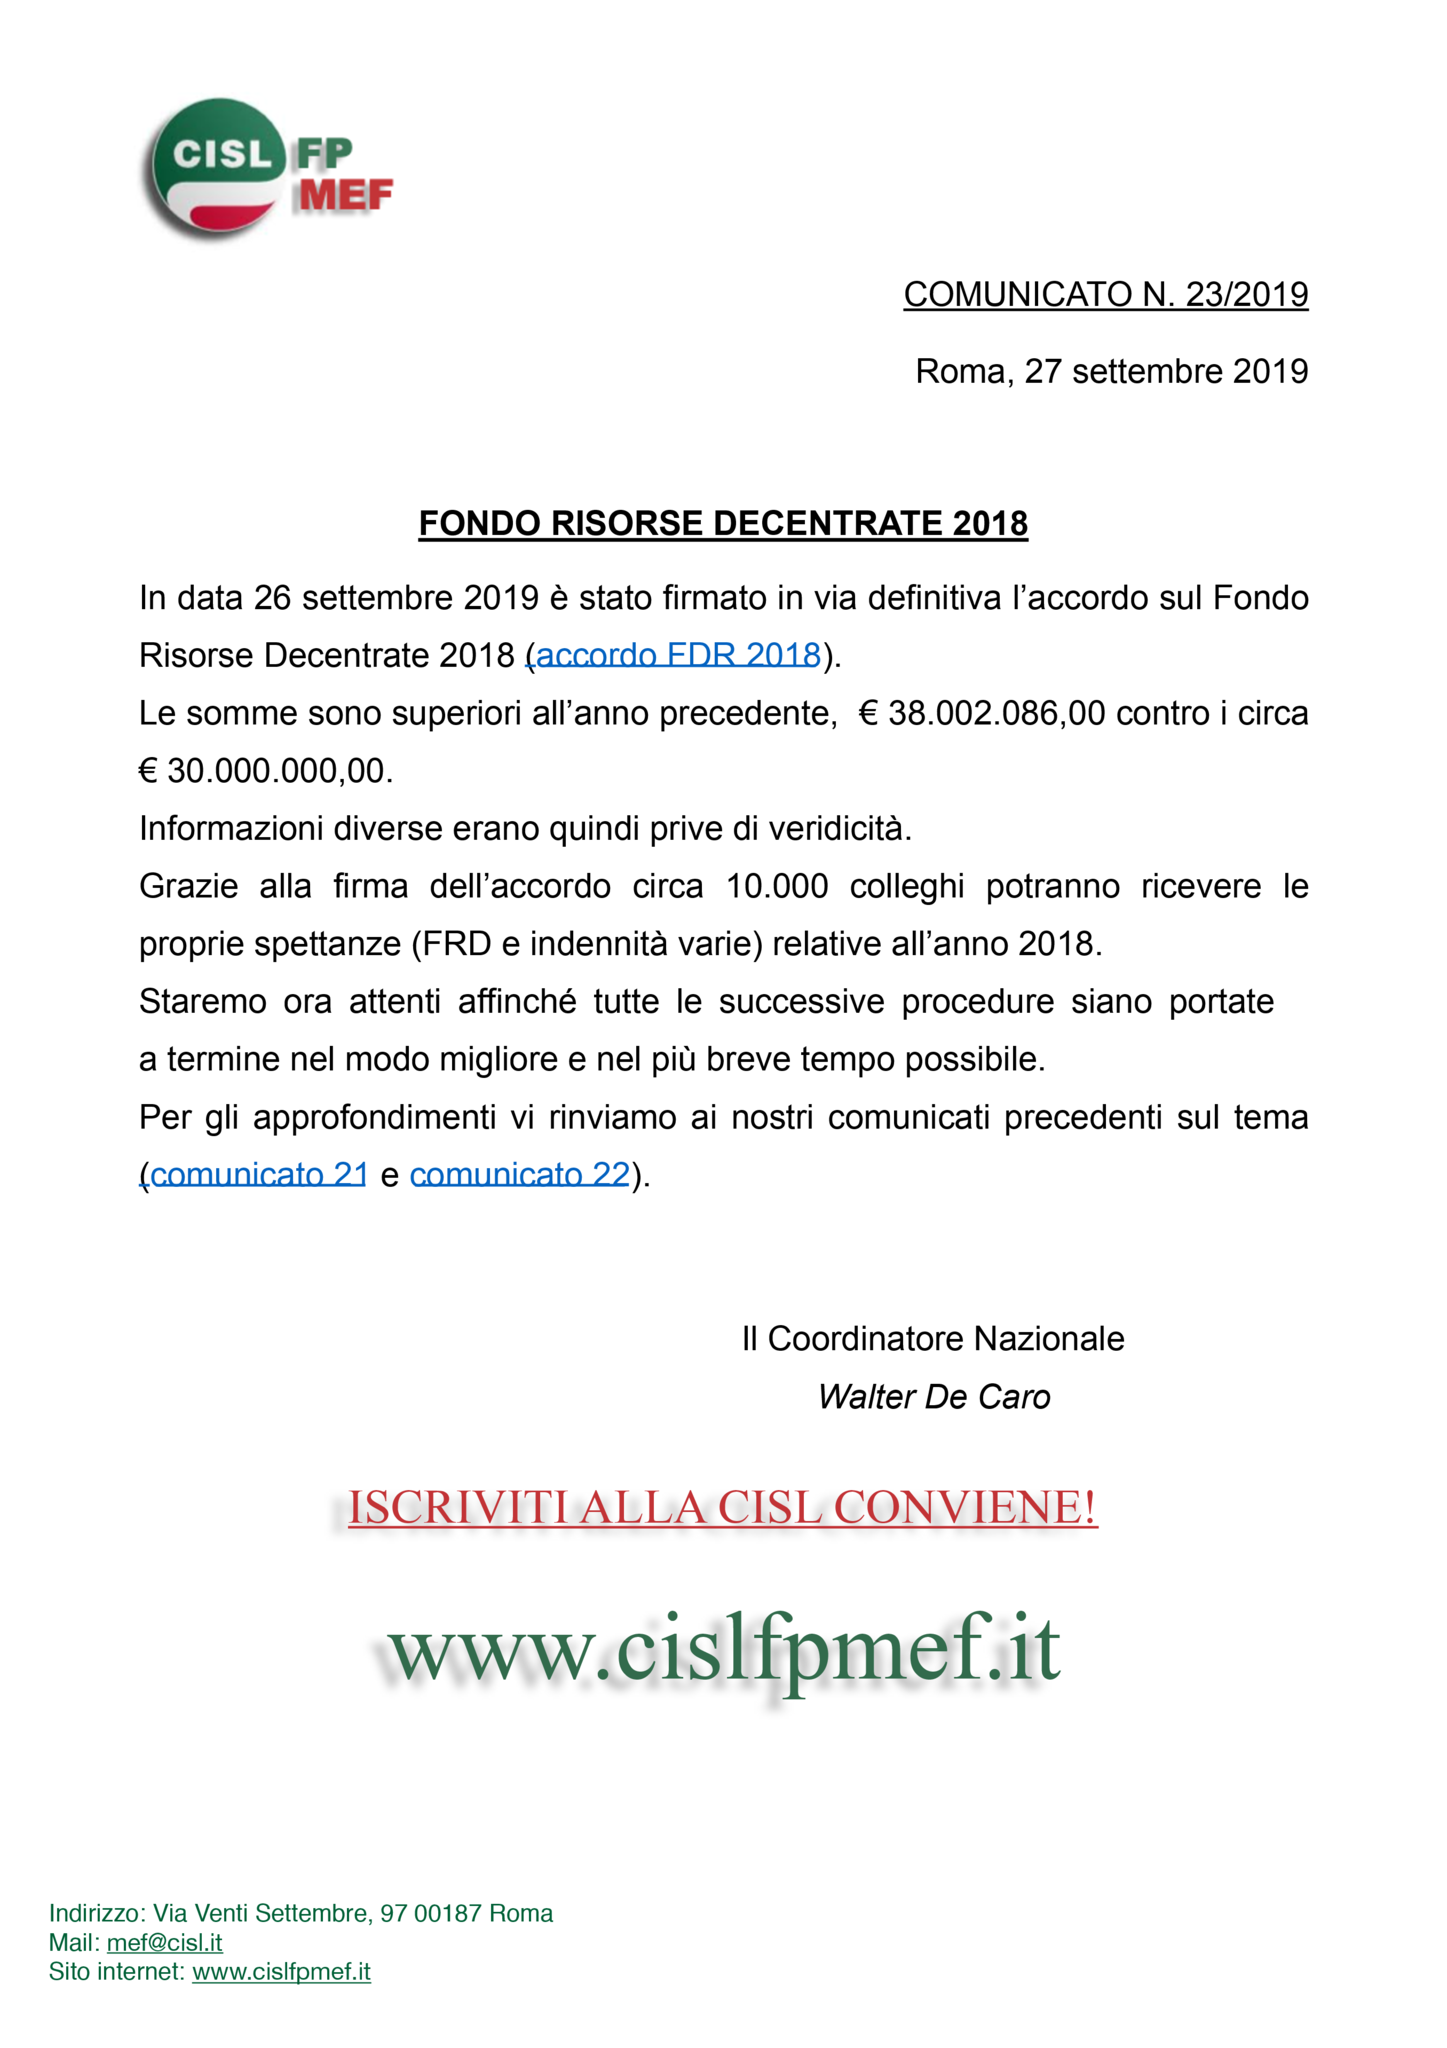 thumbnail of 23-comunicato-accordo-FRD-2018-Definitivo